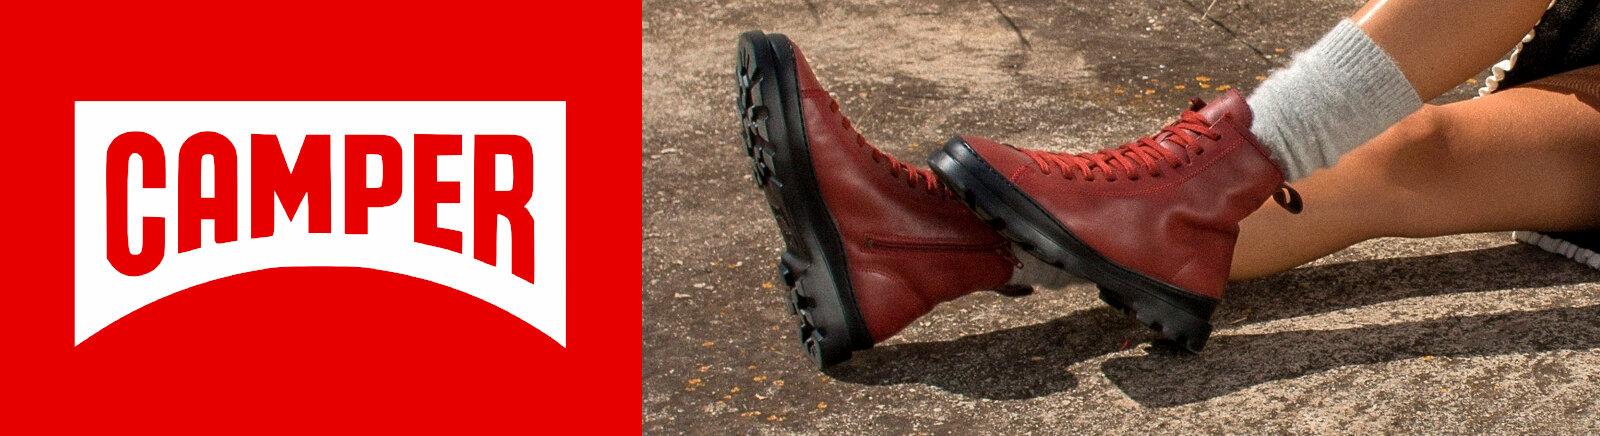 Juppen: Camper Boots für Herren online shoppen